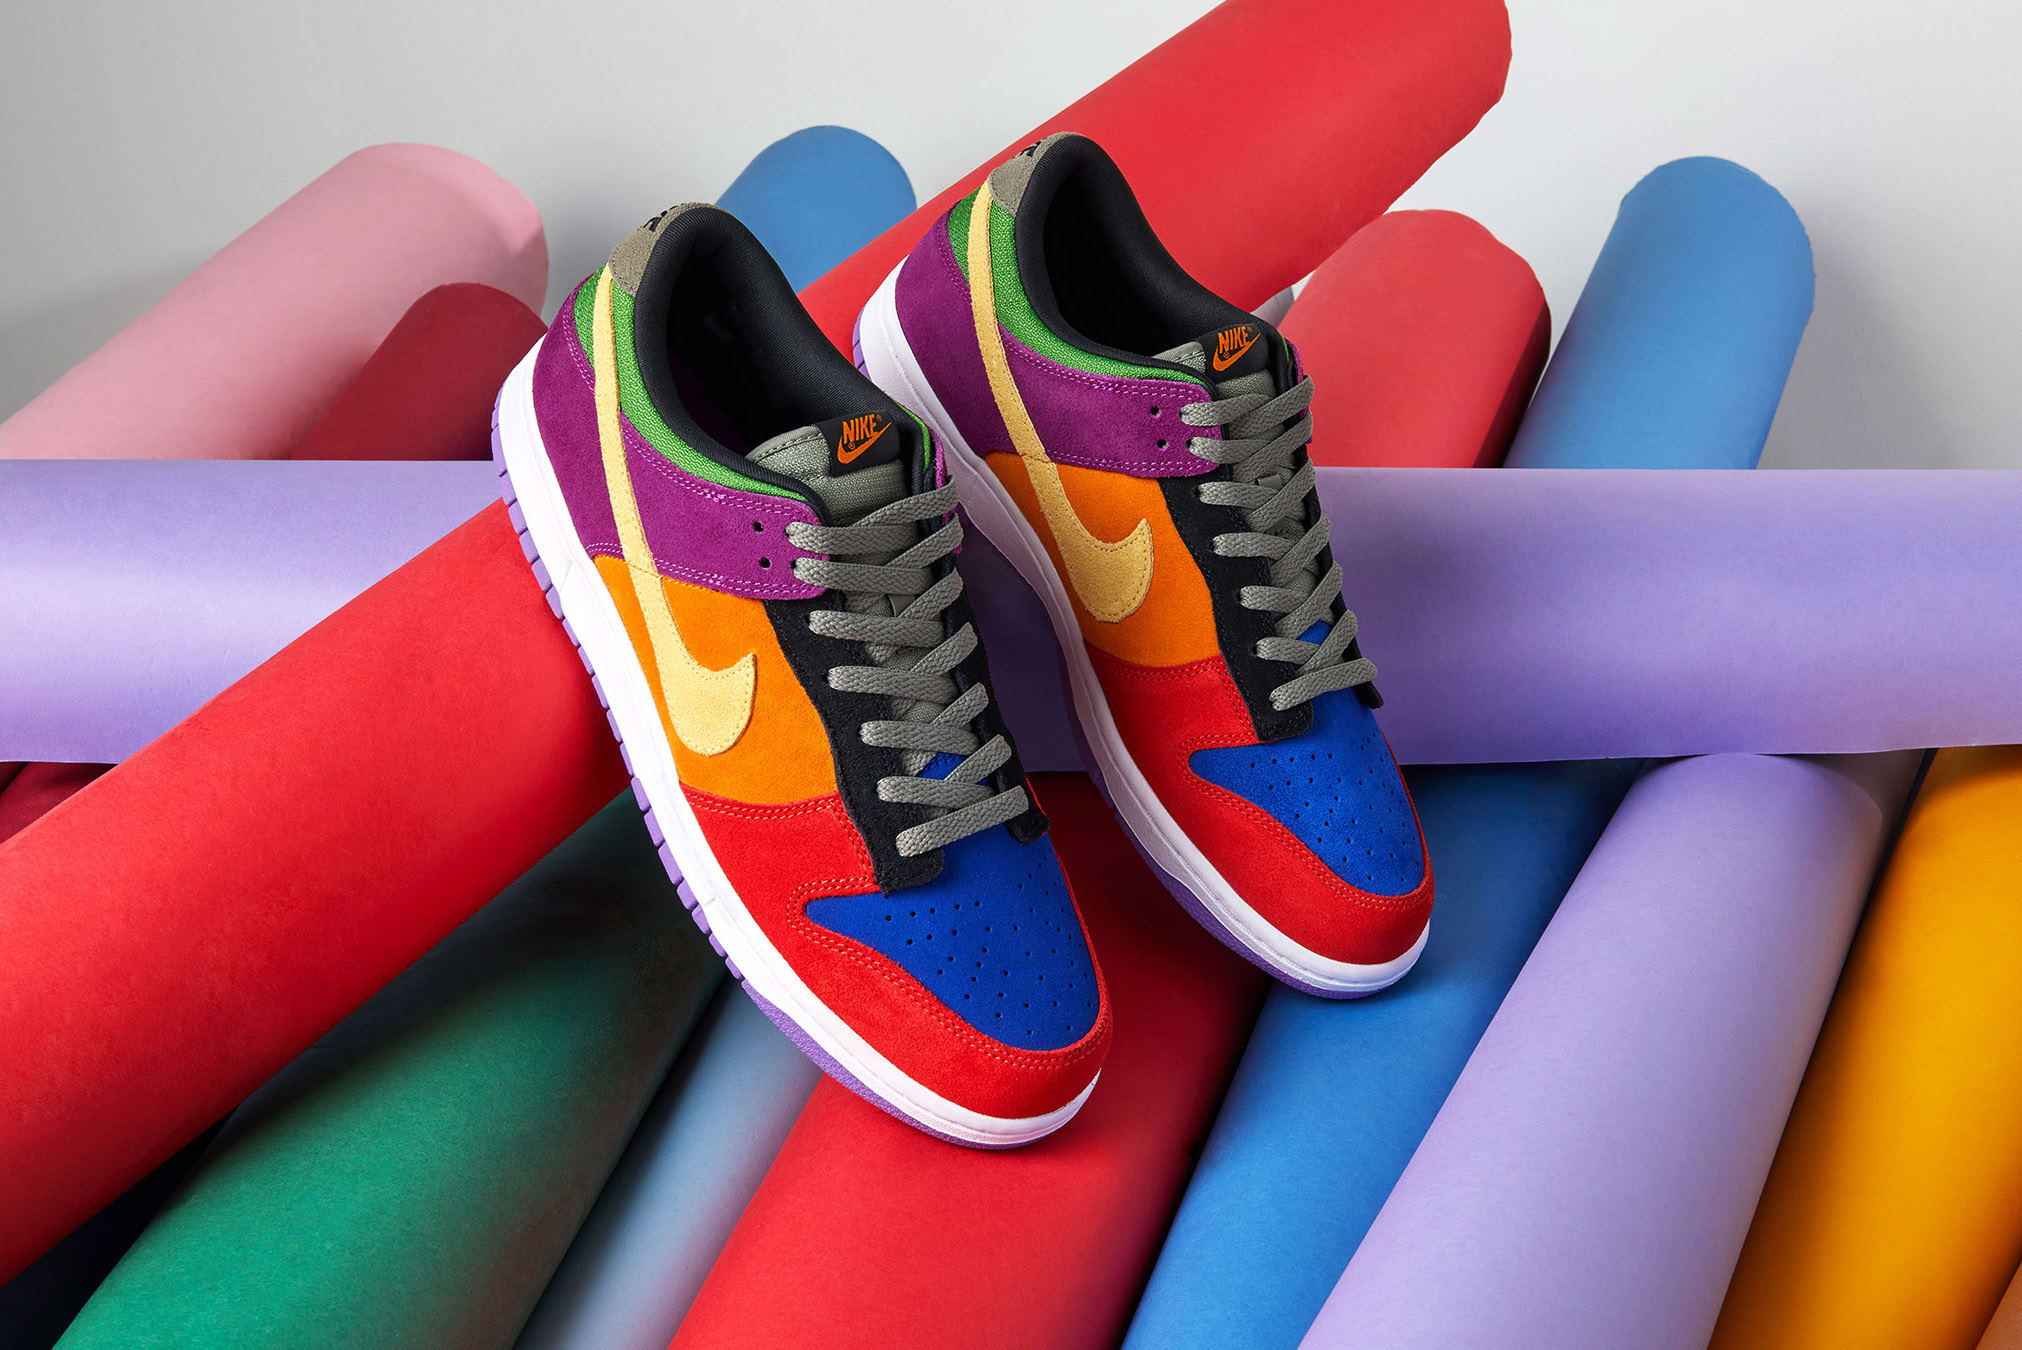 Nike Dunk Low 'Viotech' - CT5050-500